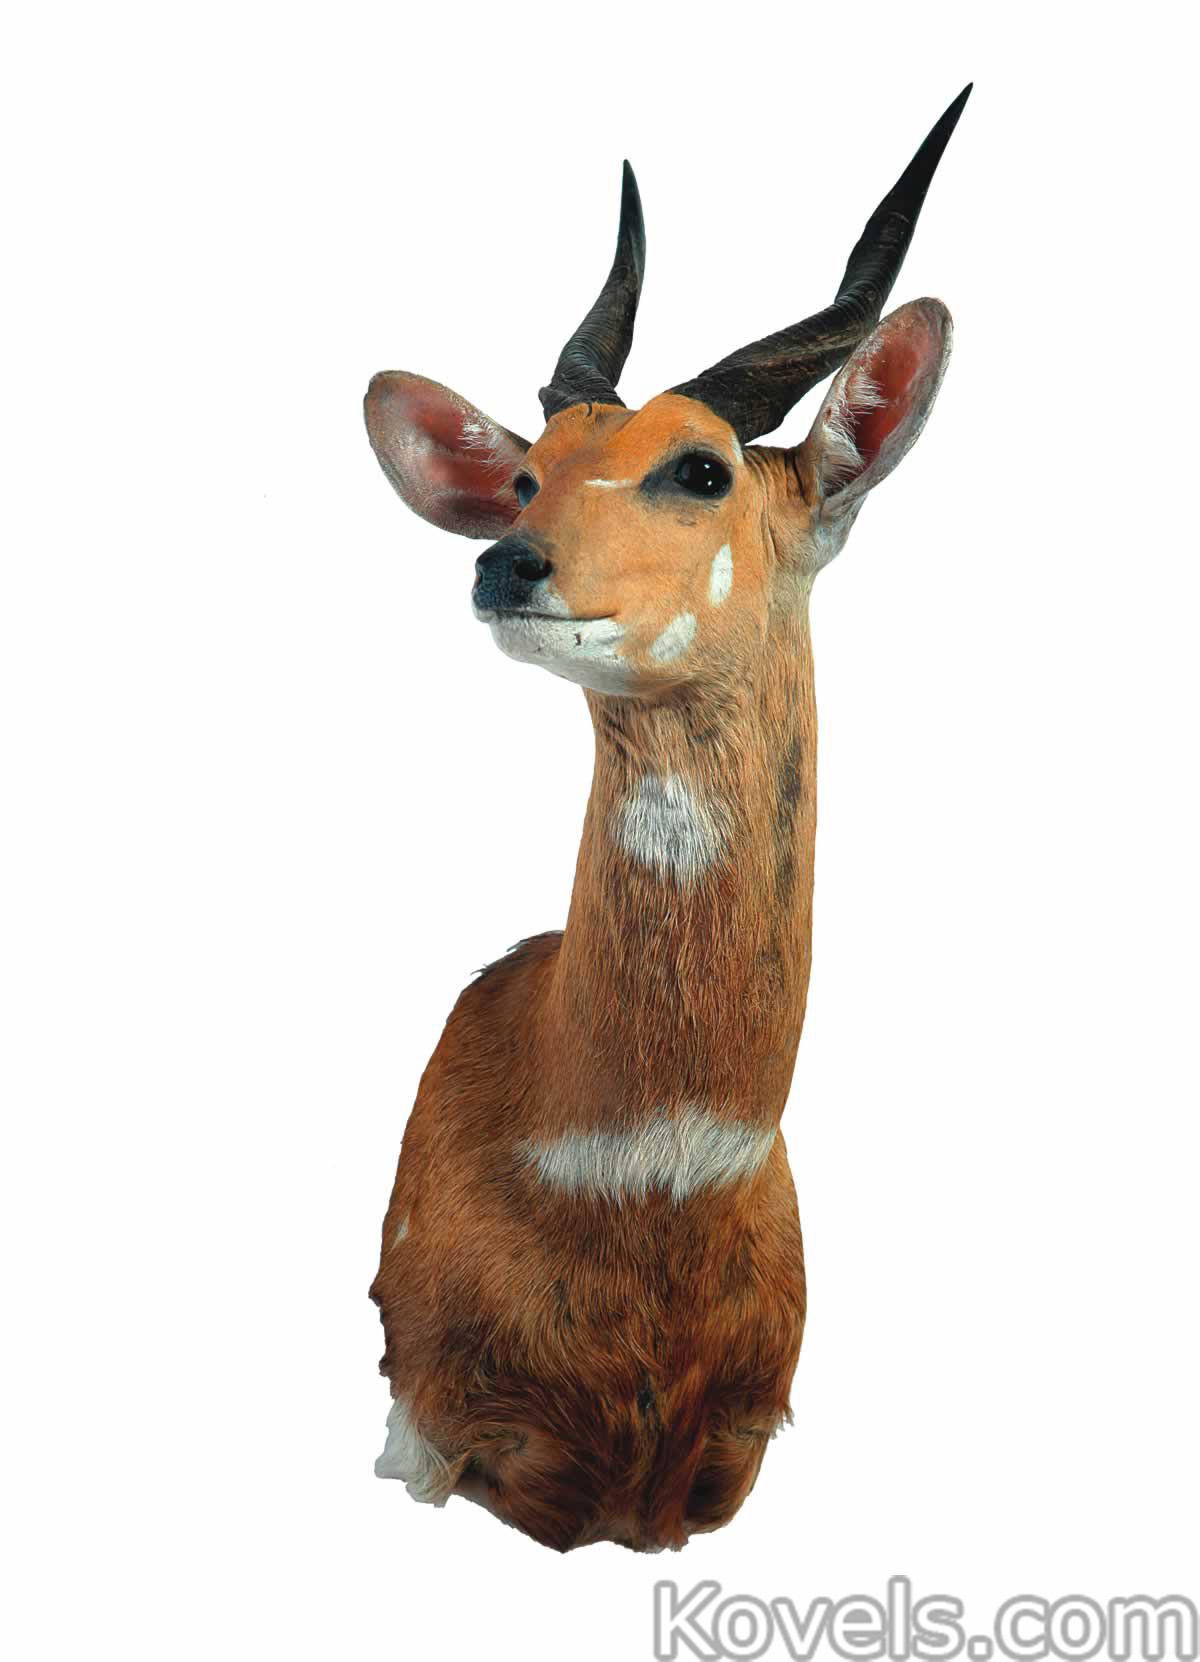 animal-trophy-antelope-bushbuck-shoulder-mount-ga072414-4233.jpg